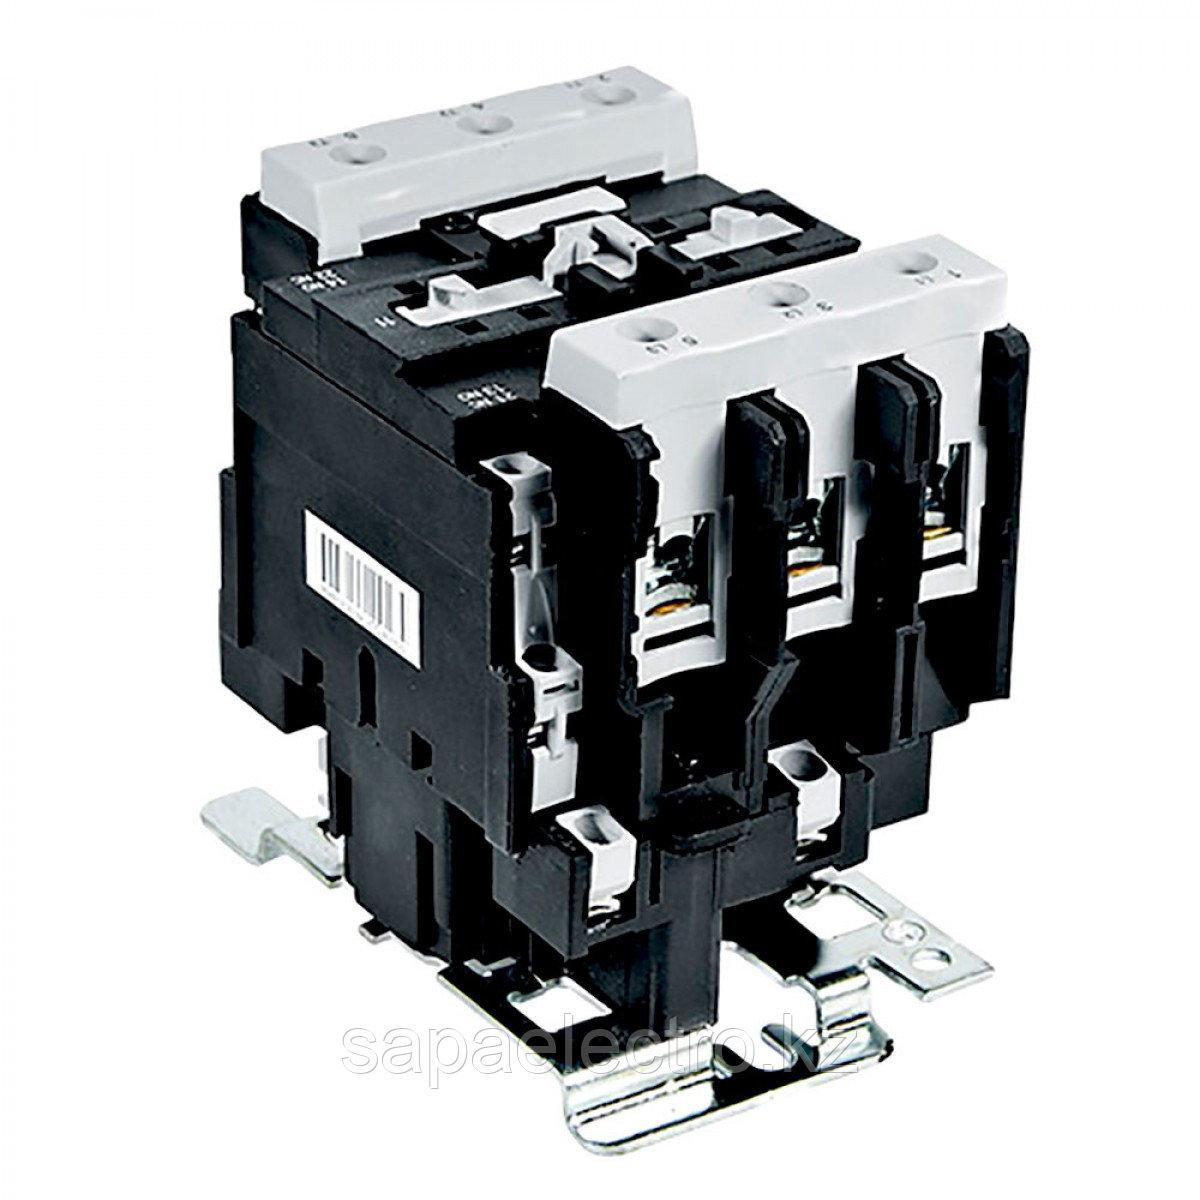 VTC-50/11/S AC CONTACTOR 50A 1NO+1NC 230V(VIK)12шт